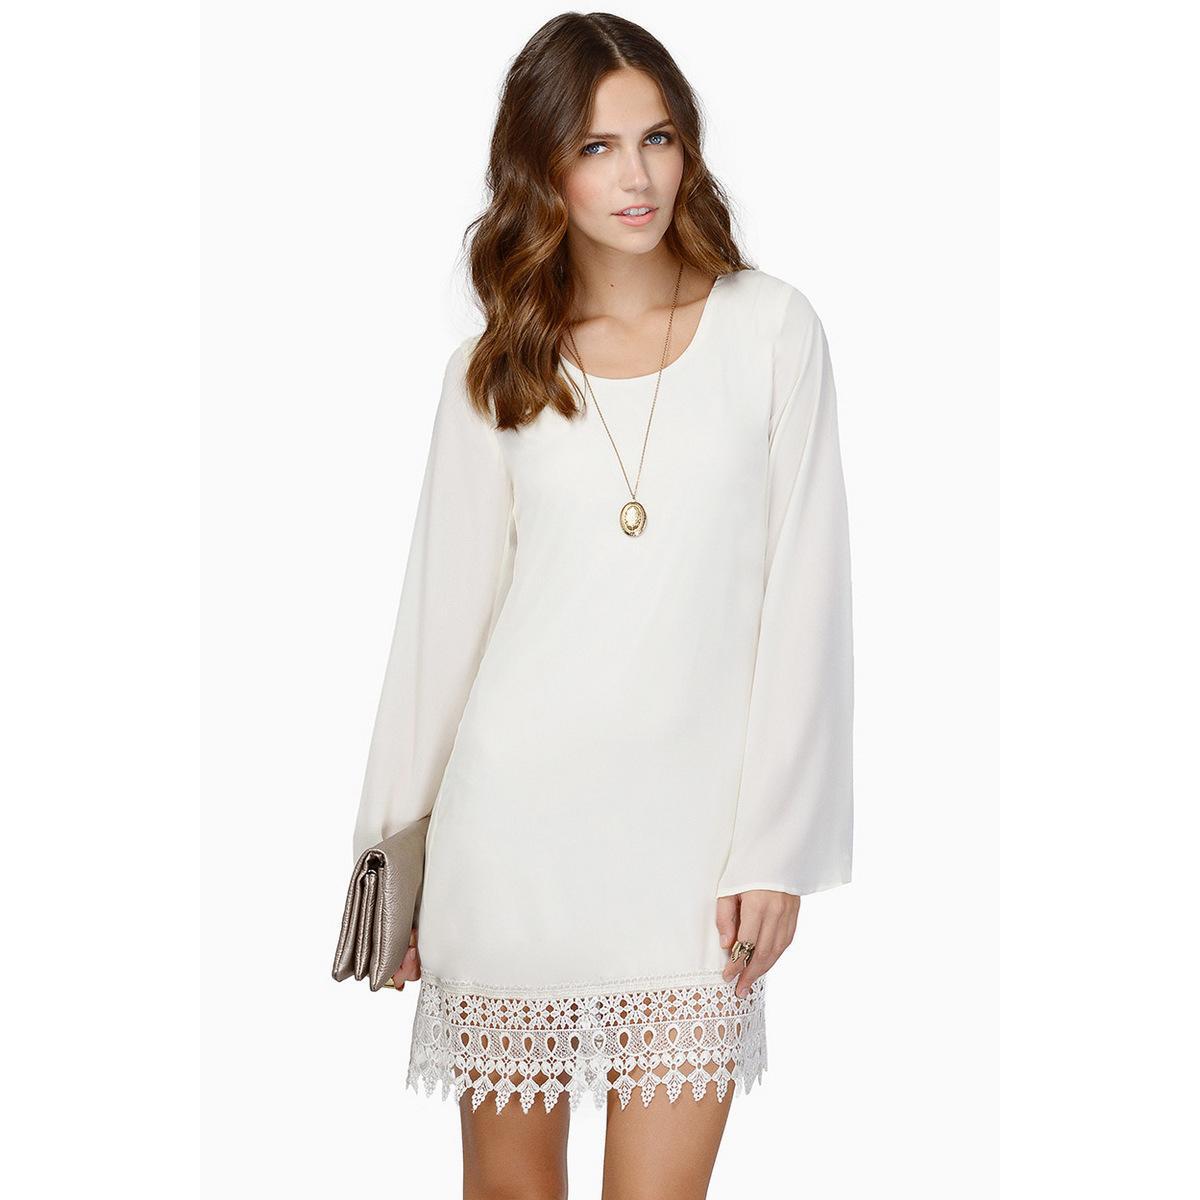 2018 Women Plus Size Chiffon Loose Dress Long Sleeve O Neck Contrat Frill  Mini Dress MT1024 All White Maxi Dress Cute White Summer Dresses From ...